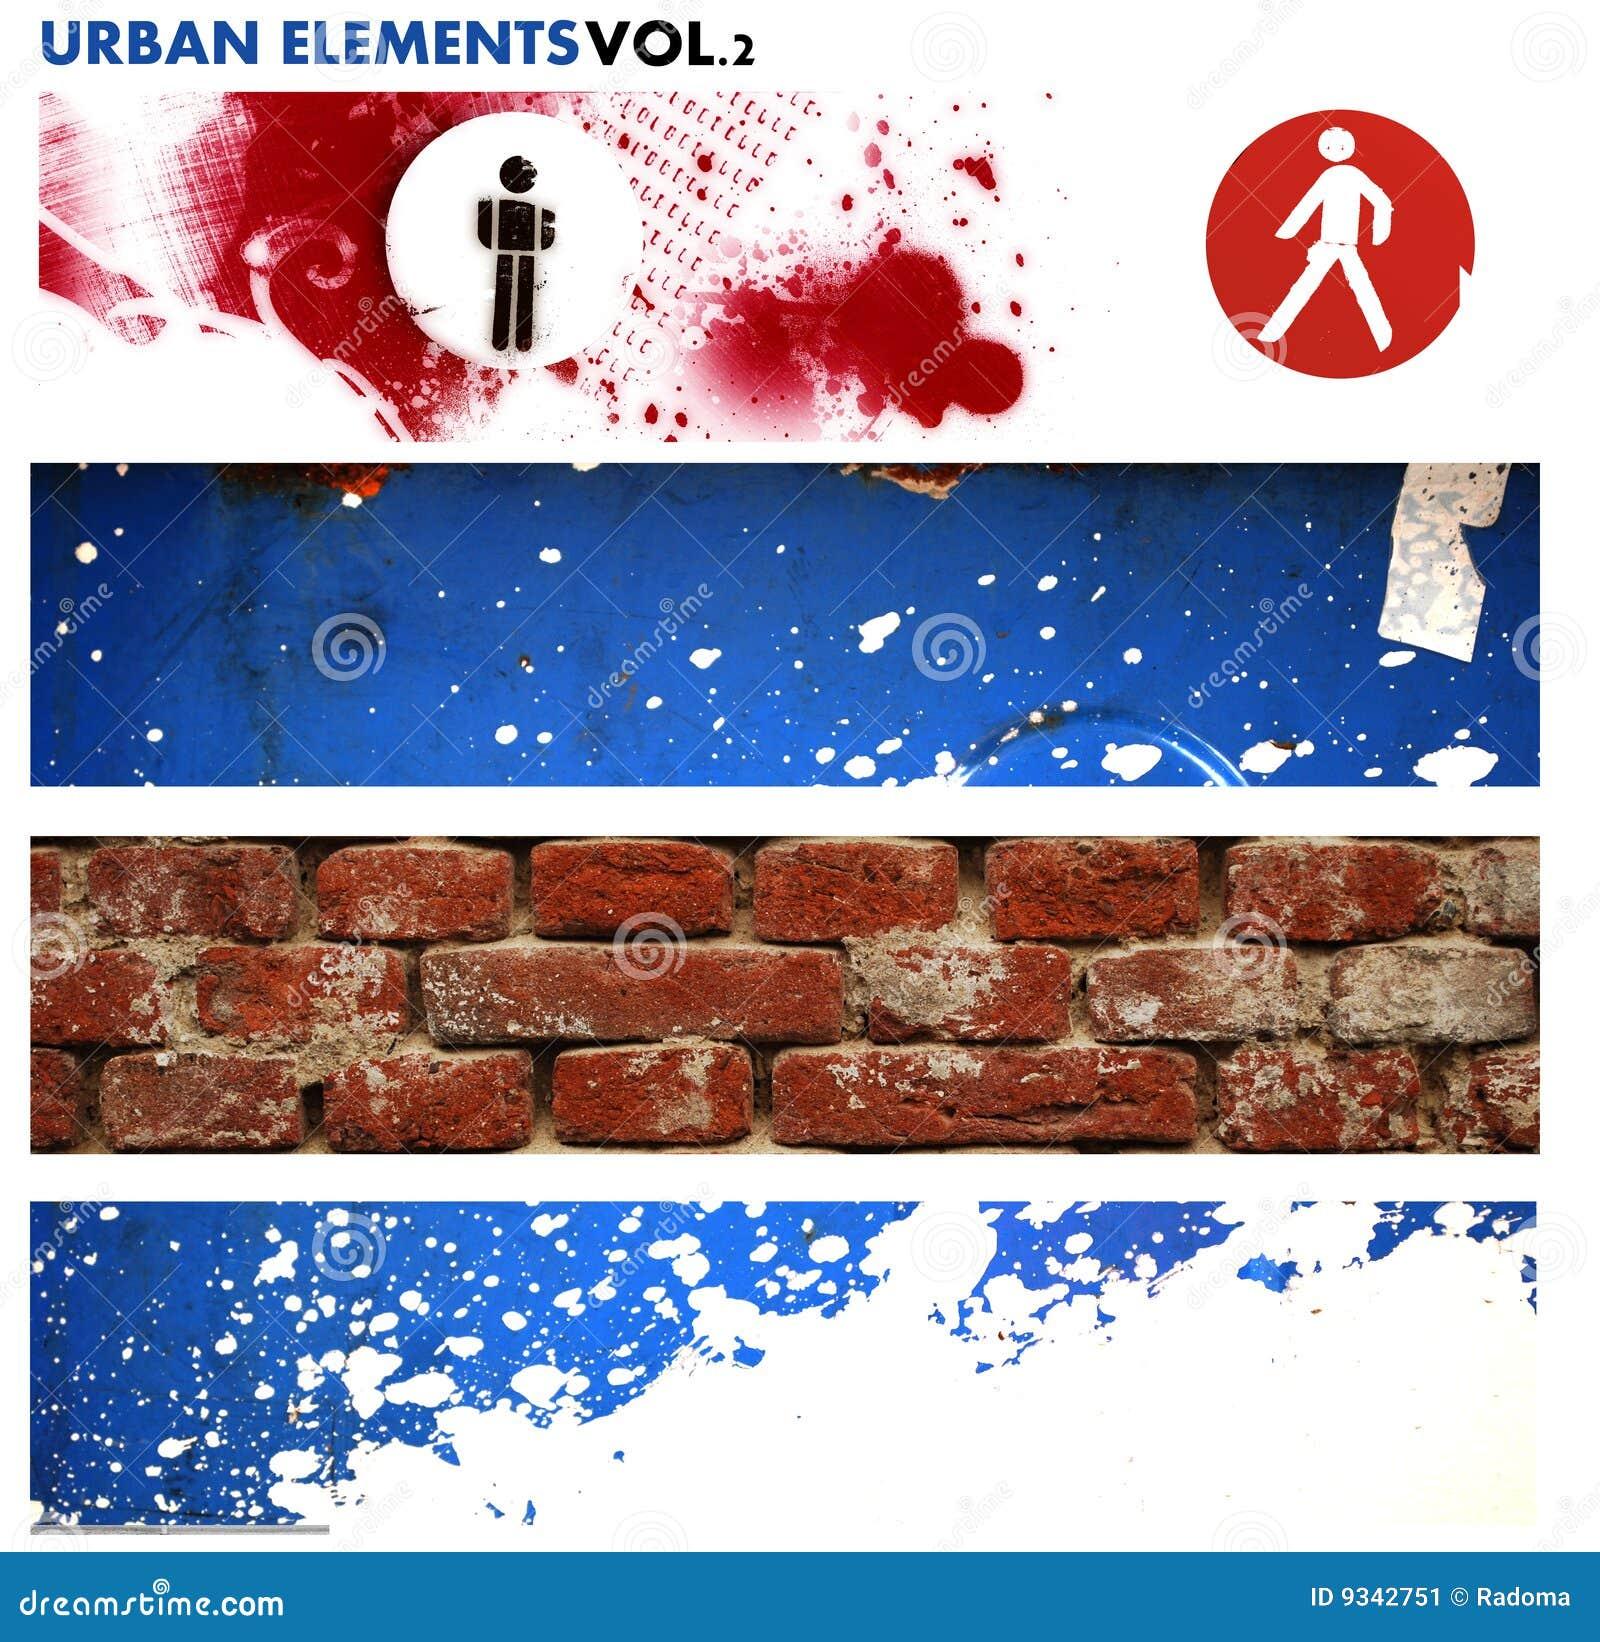 Elementos gráficos urbanos 2